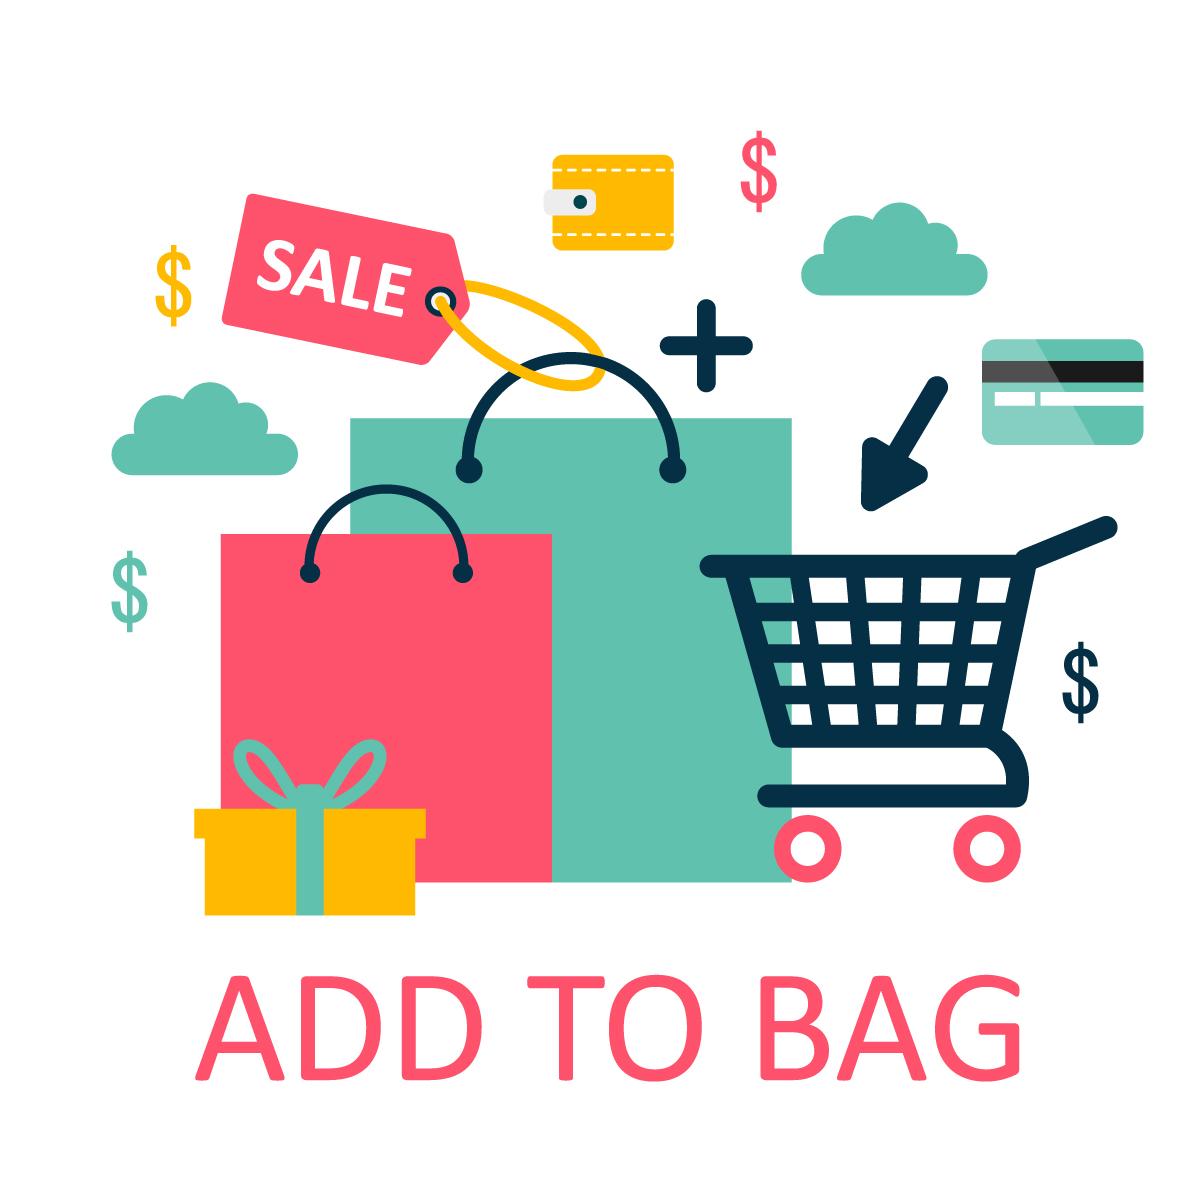 C:\Users\Пользователь\Downloads\Different-elements-for-online-shopping\848.jpg